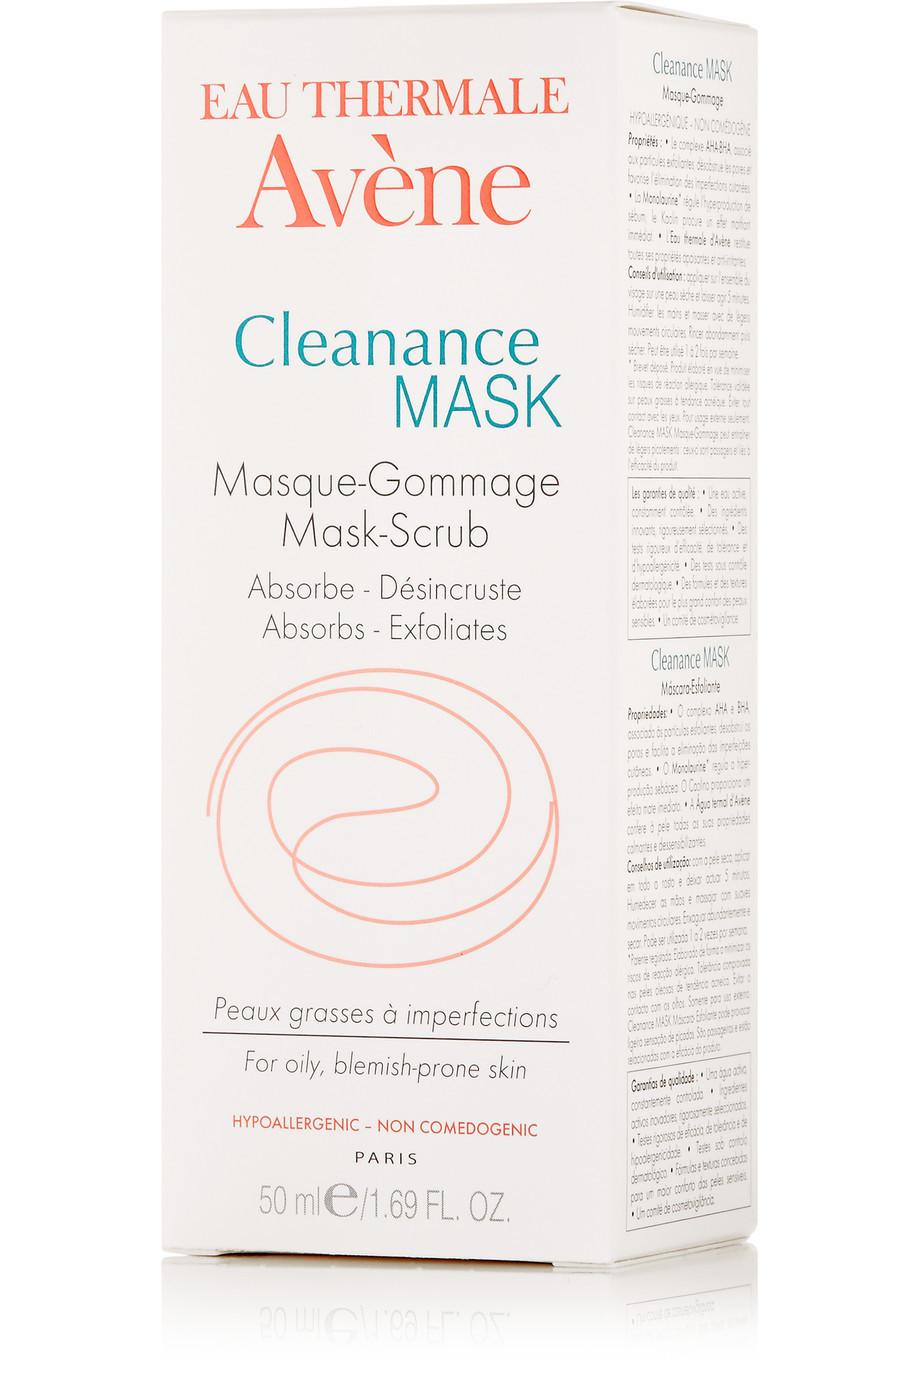 AVENE Cleanance Mask, 50ml $24